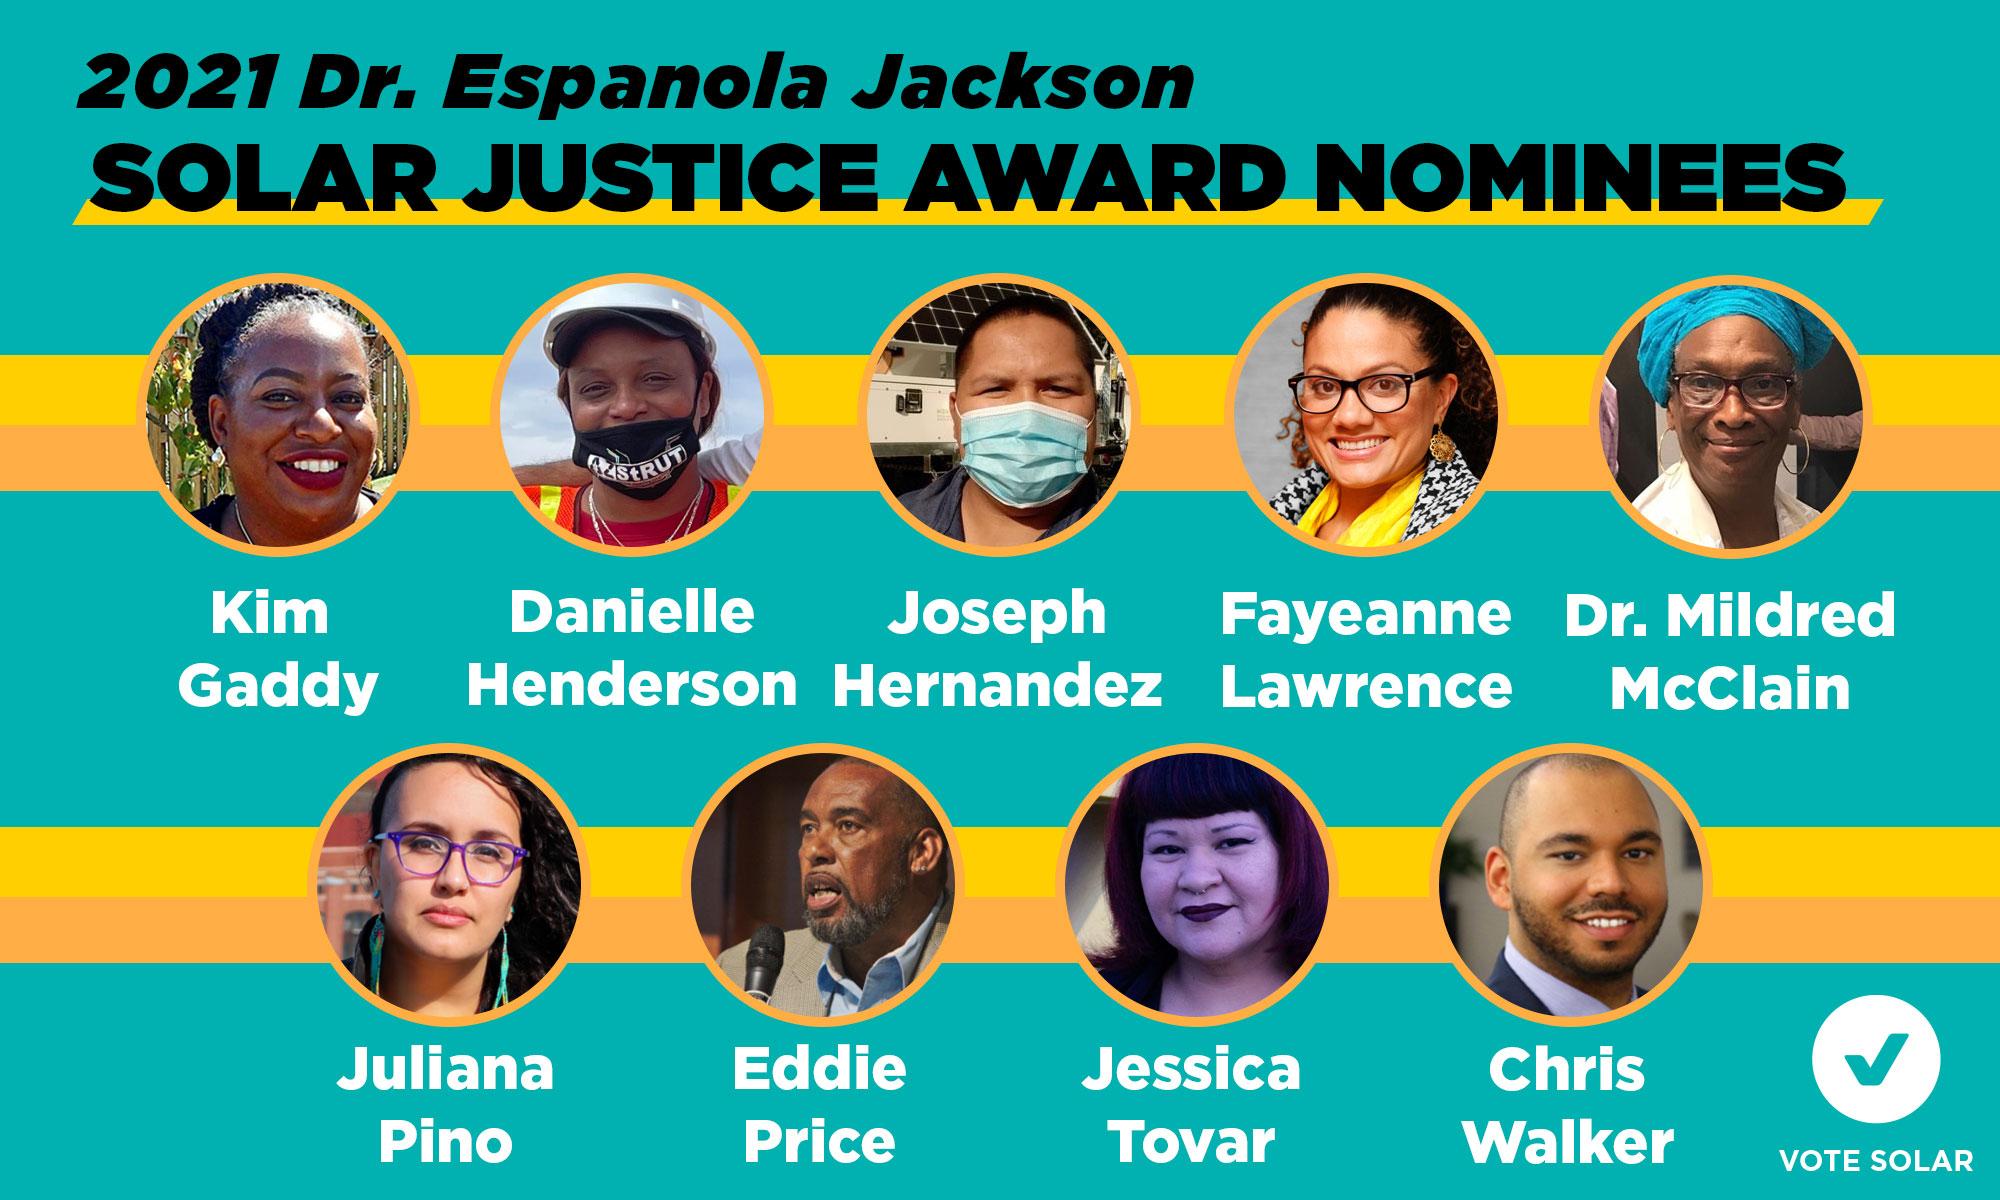 Meet the 2021 Dr. Espanola Jackson Solar Justice Award Nominees